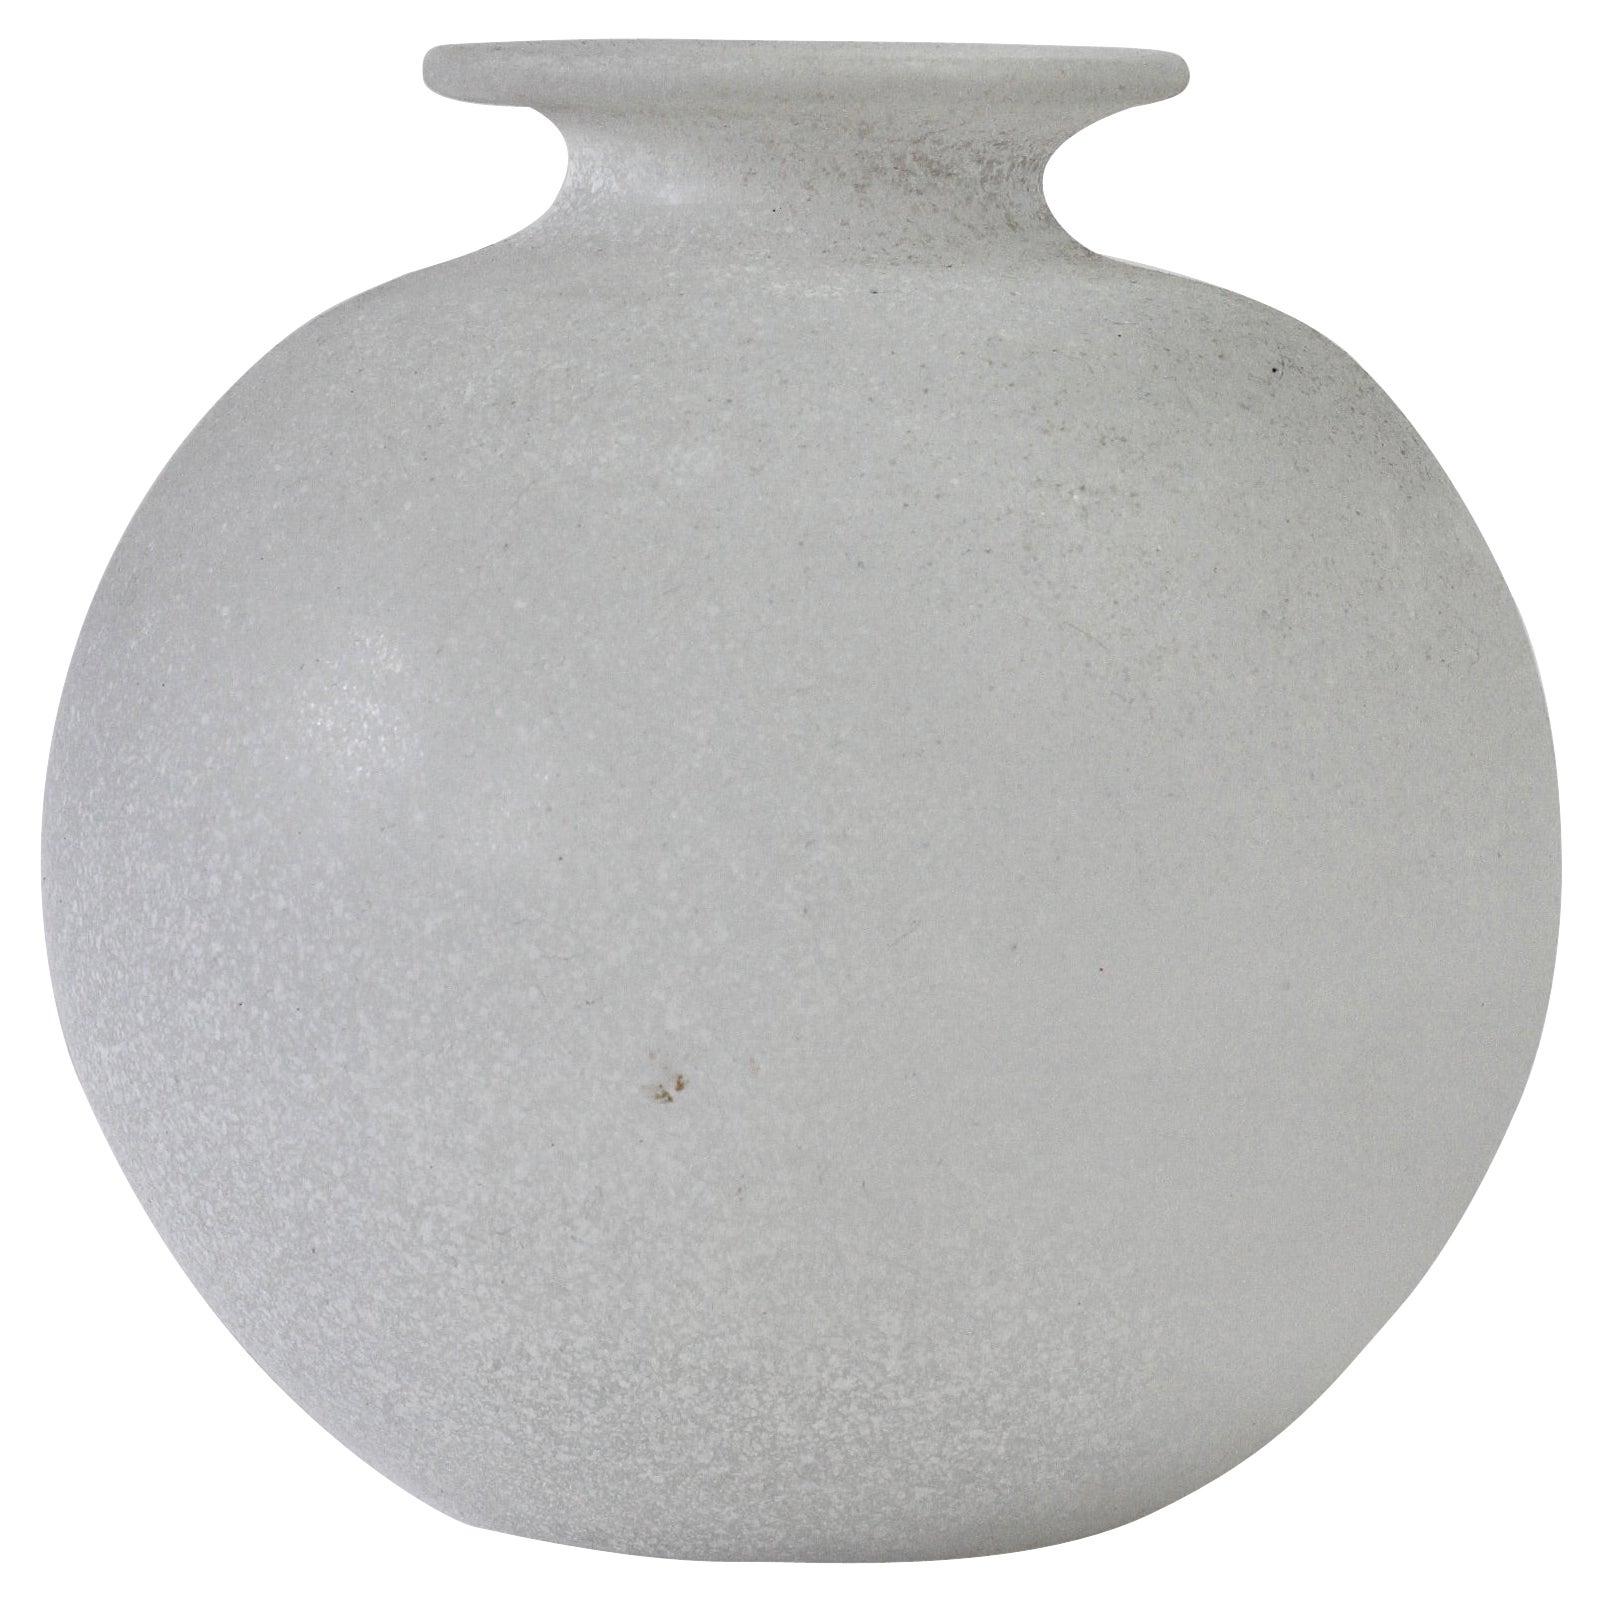 Seguso Vetri d'Arte Vintage Elegant Round White 'Scavo' Murano Glass Vase, Italy